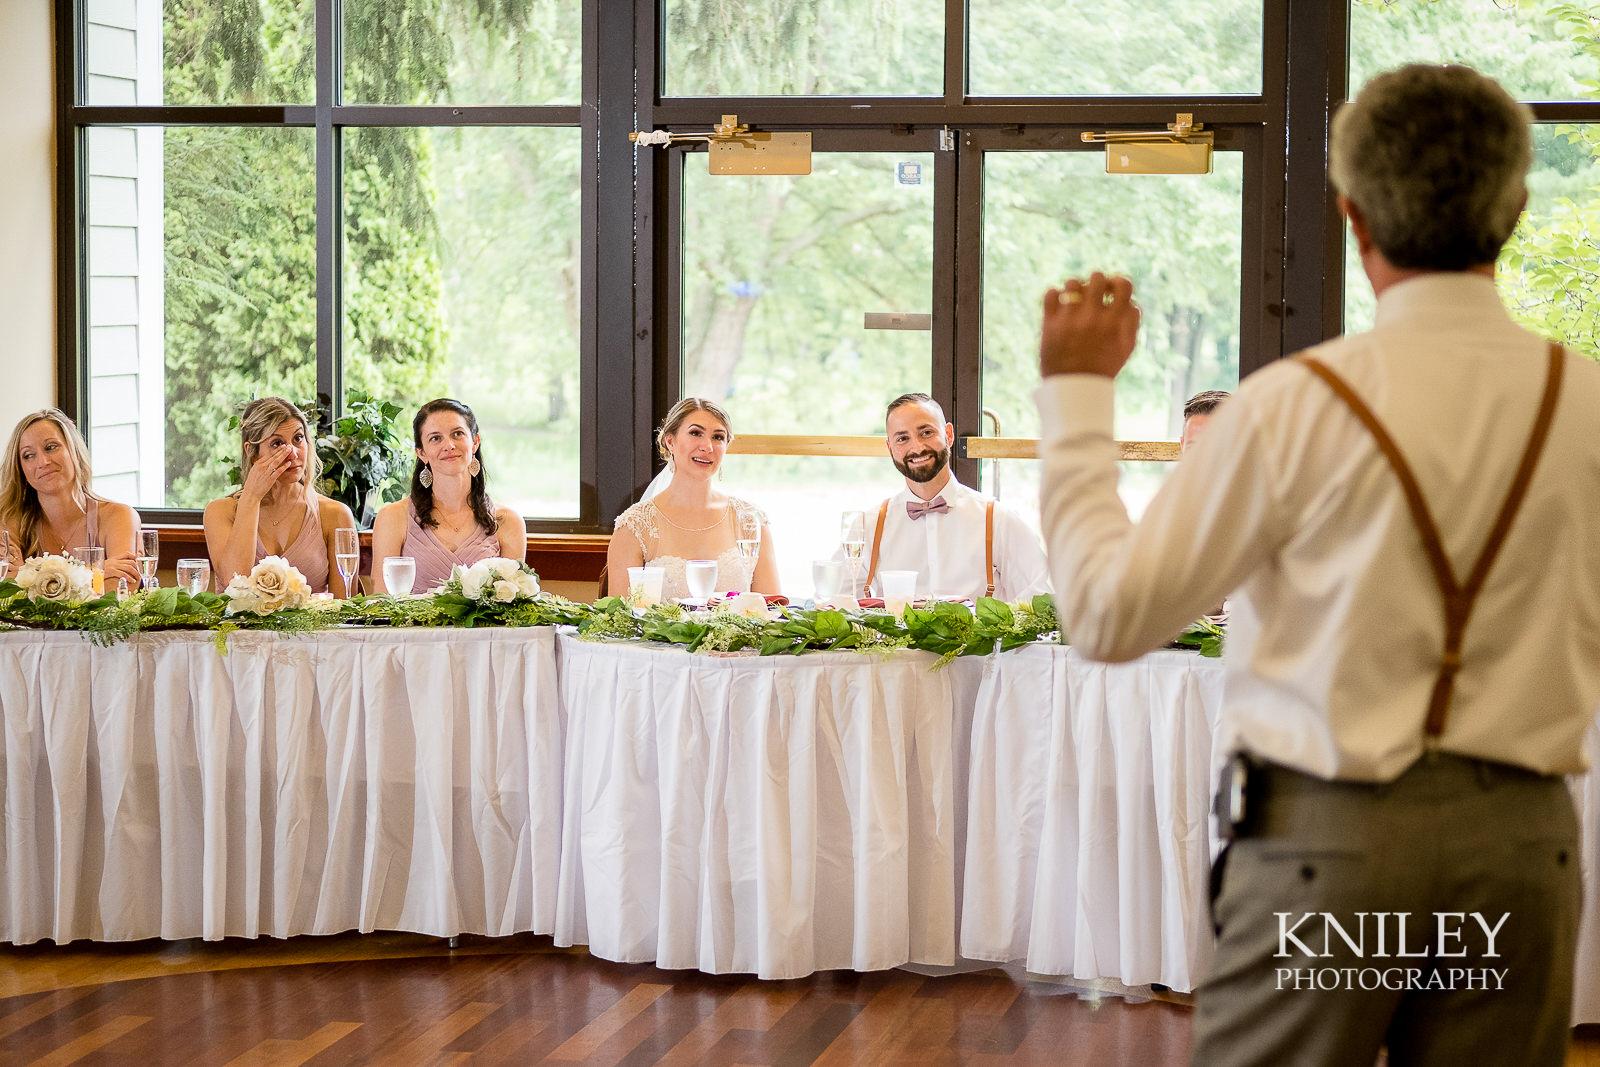 087 - Ontario Golf Club Wedding Pictures - XT2A7133.jpg